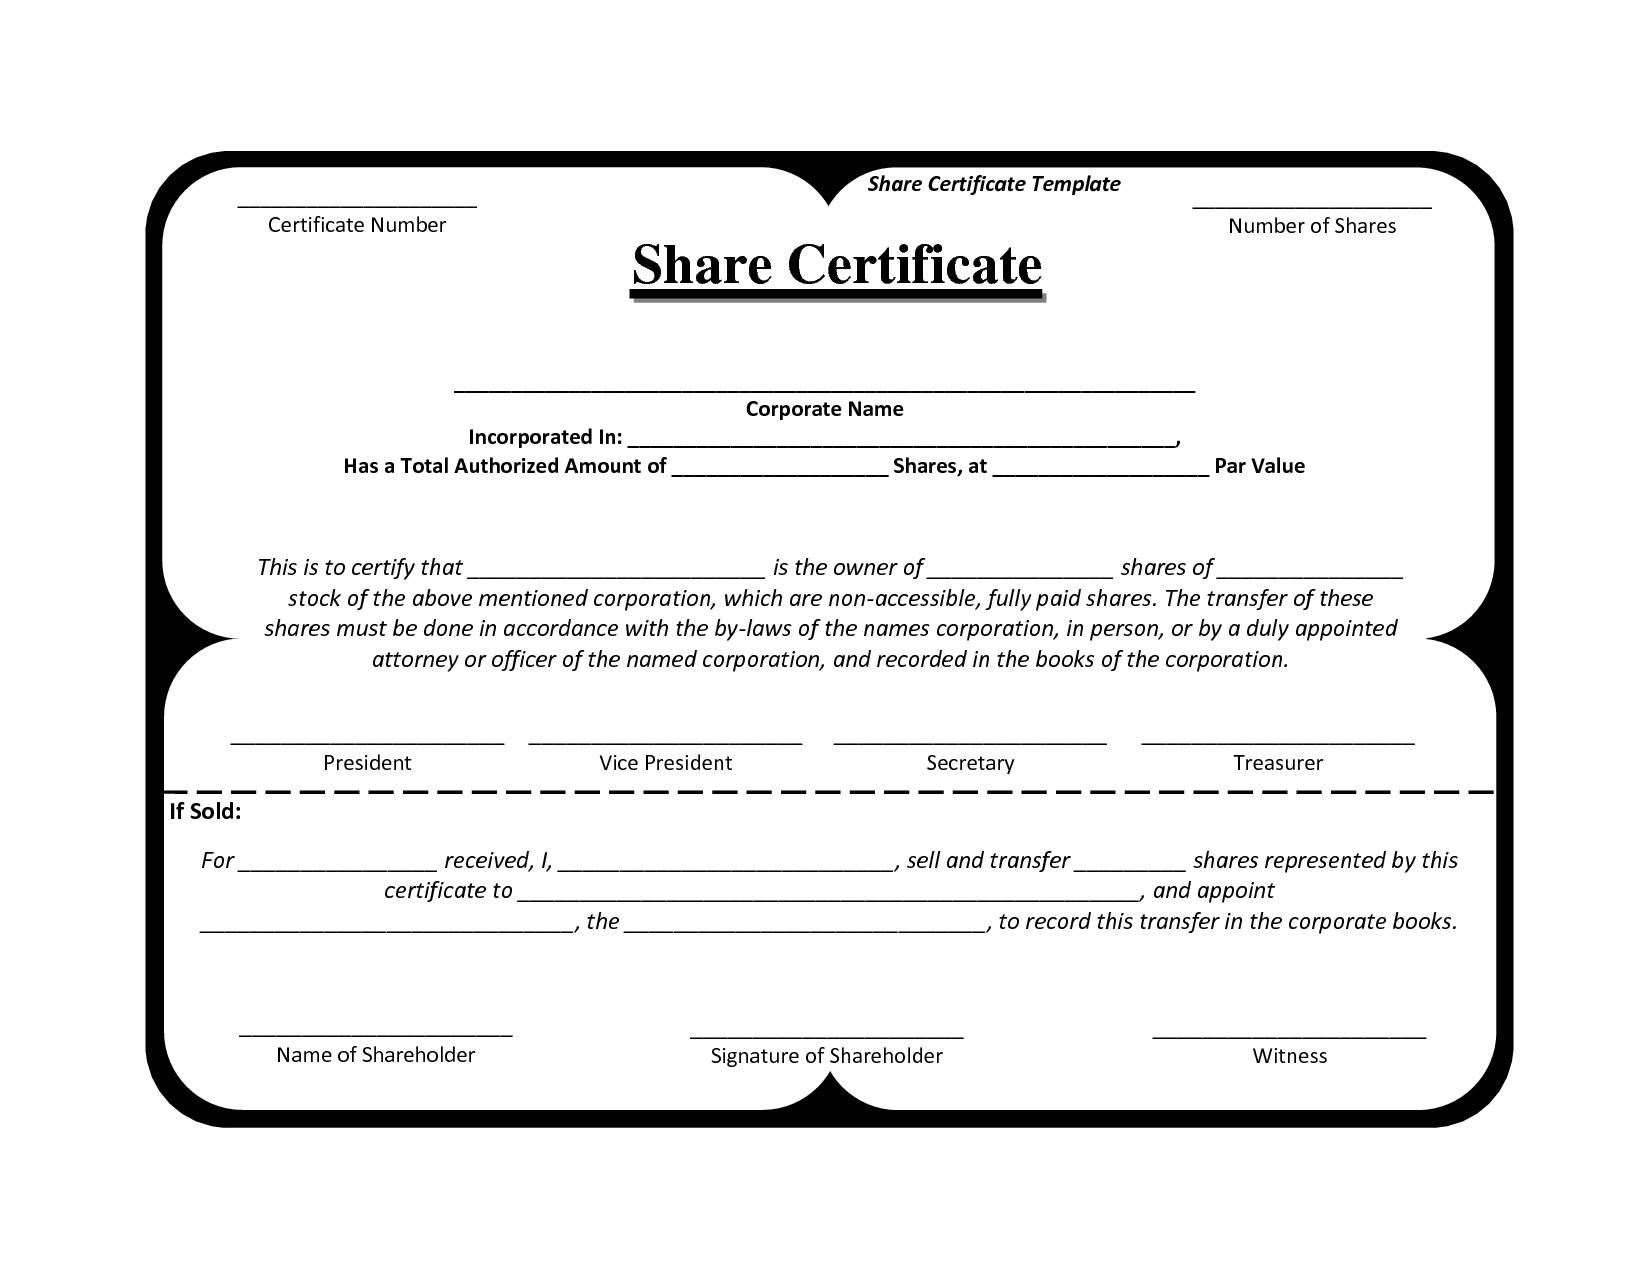 Share Certificate Template Pdf Template Share Certificate Http Webdesign14 Com